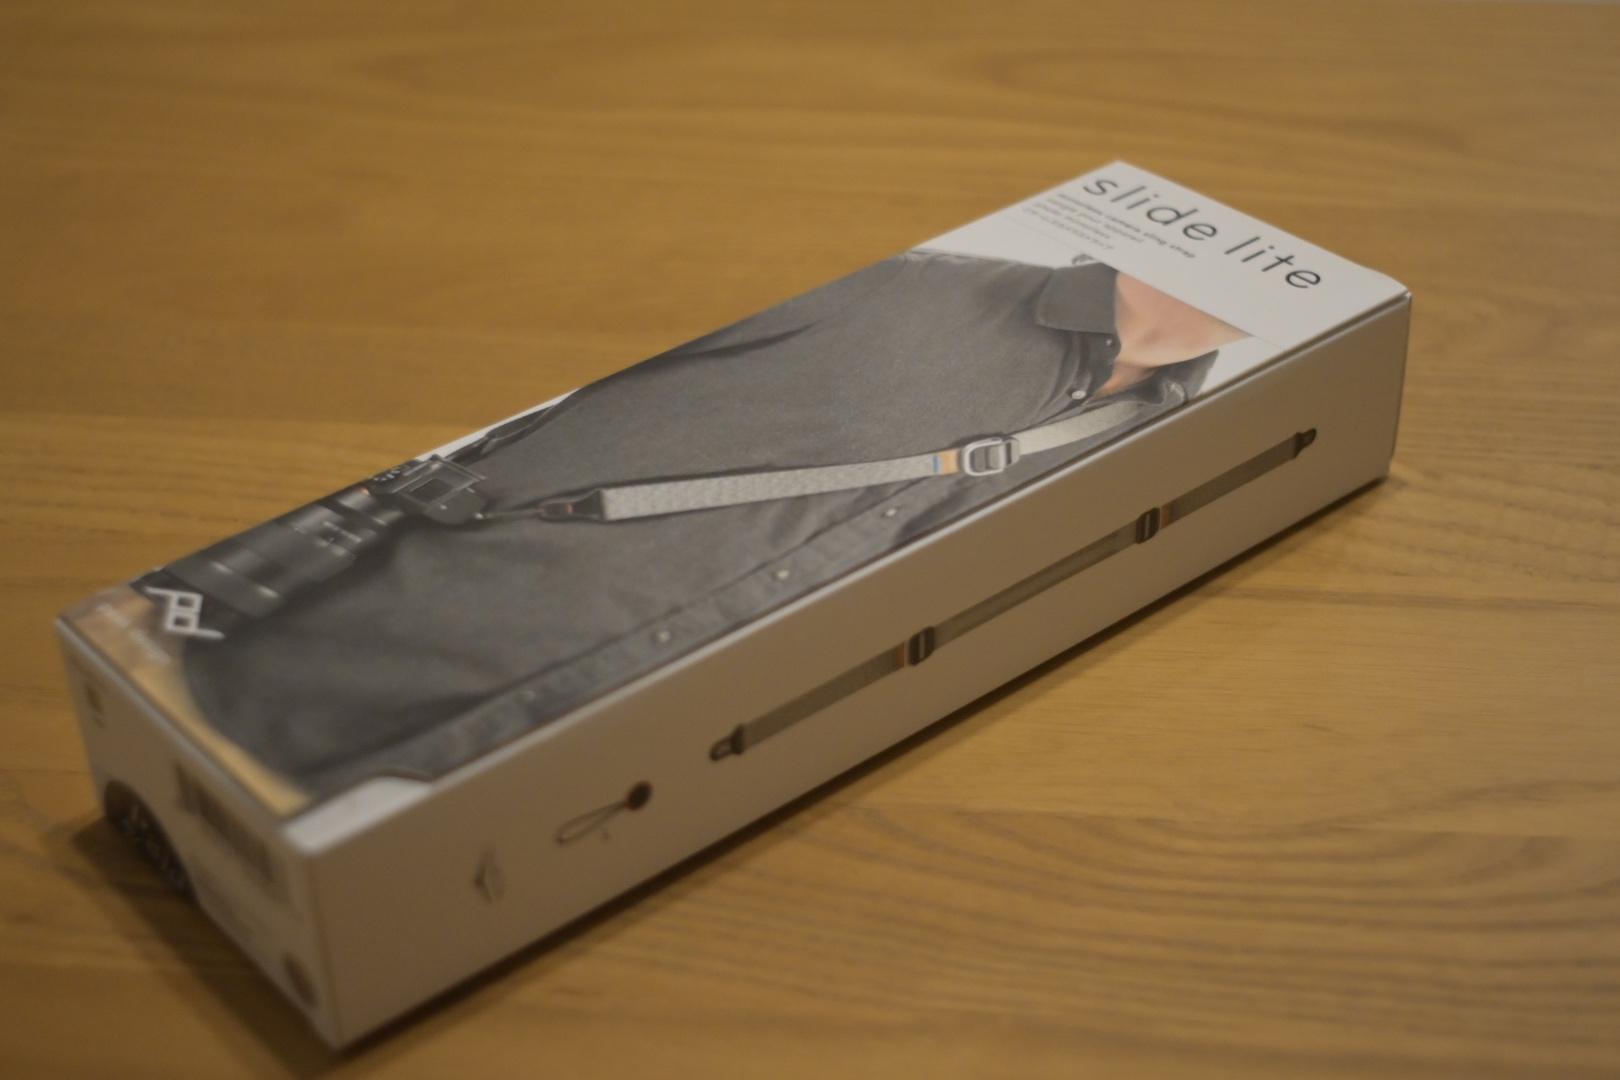 Peakdesign-slidelite-mirrorless-camera-sling-strap-bundled-items-1